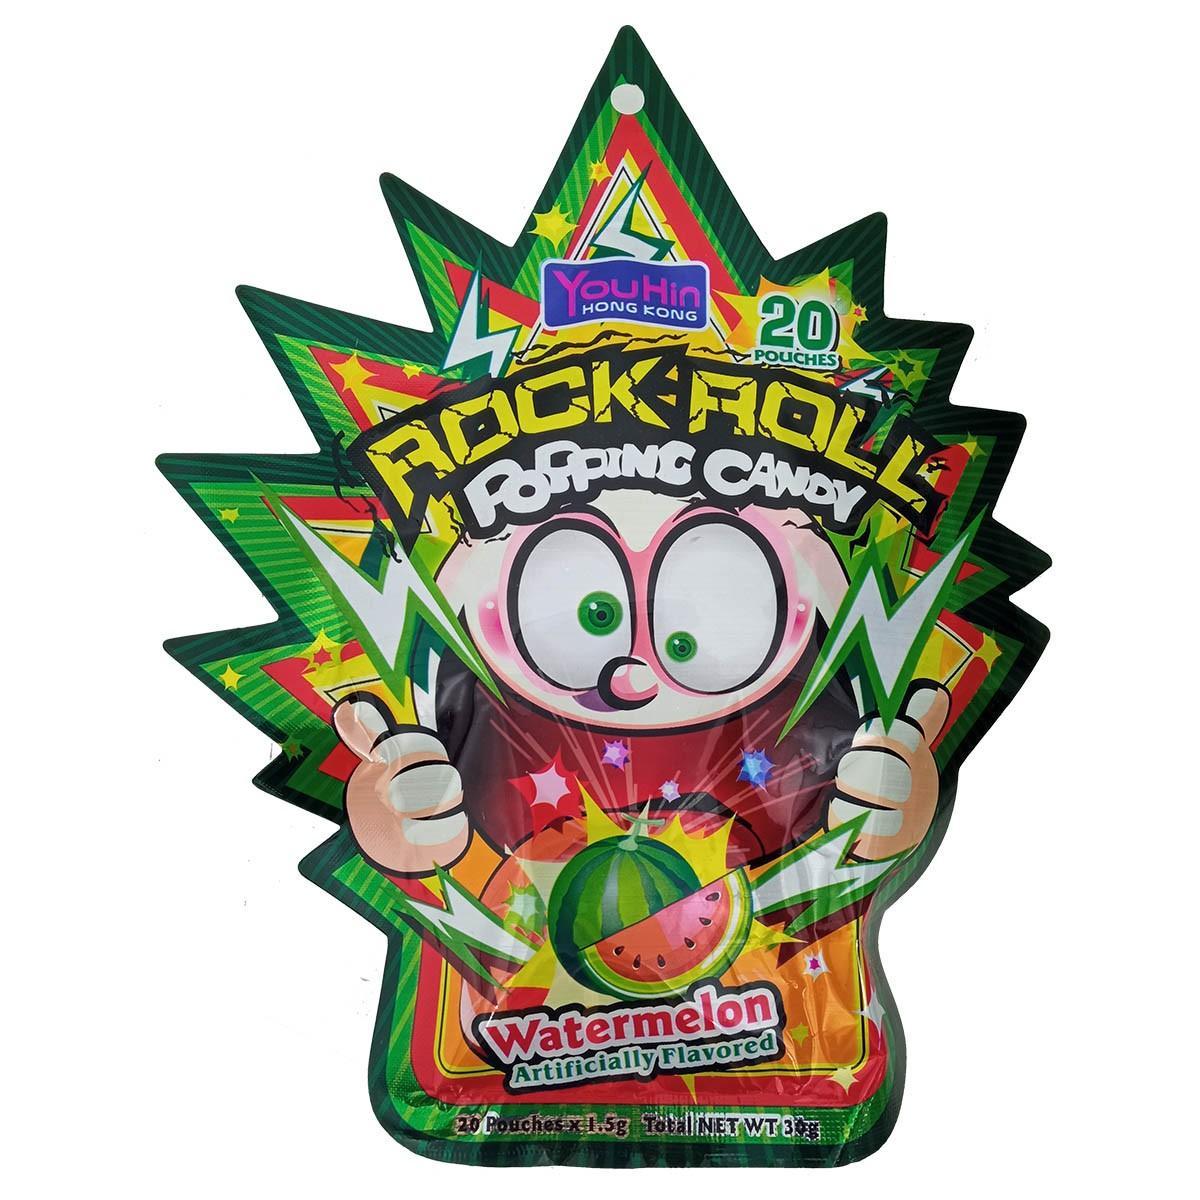 Bala Explosiva sabor Melancia Rock Roll Popping Candy 30g - YouHin HK